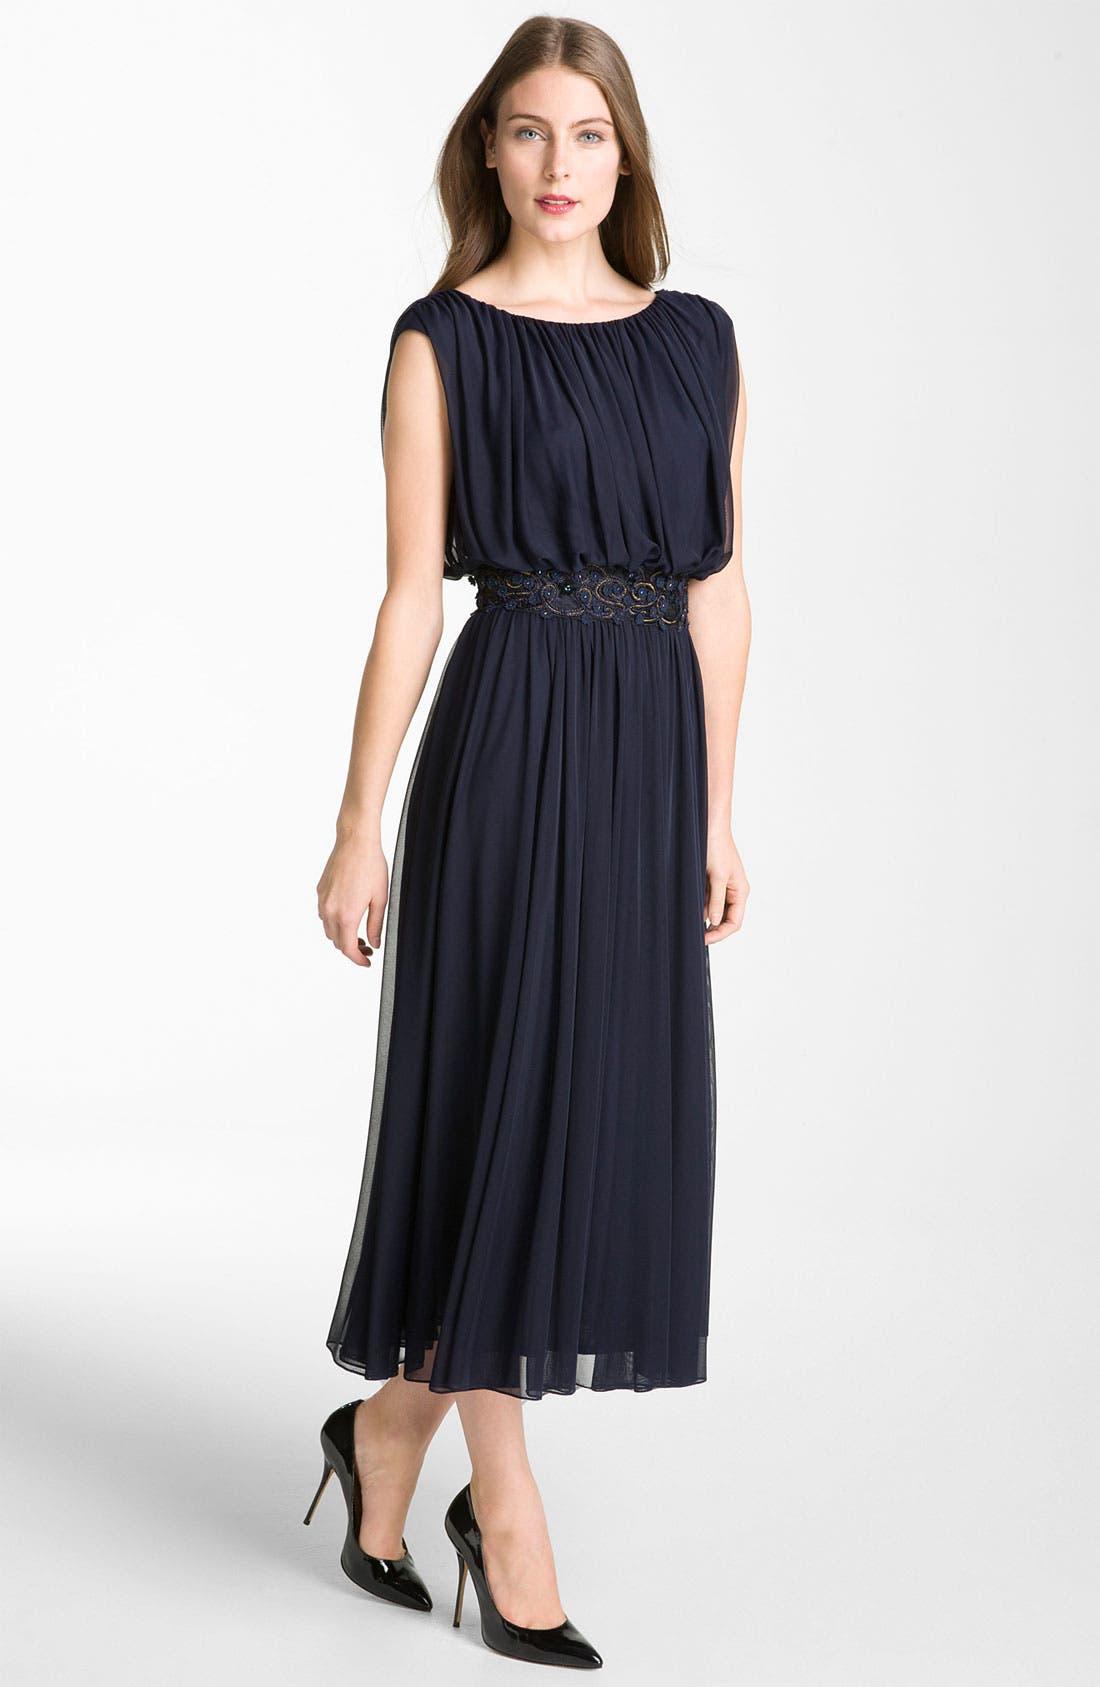 Alternate Image 1 Selected - Alex Evenings Blouson Mesh Midi Gown (Petite)